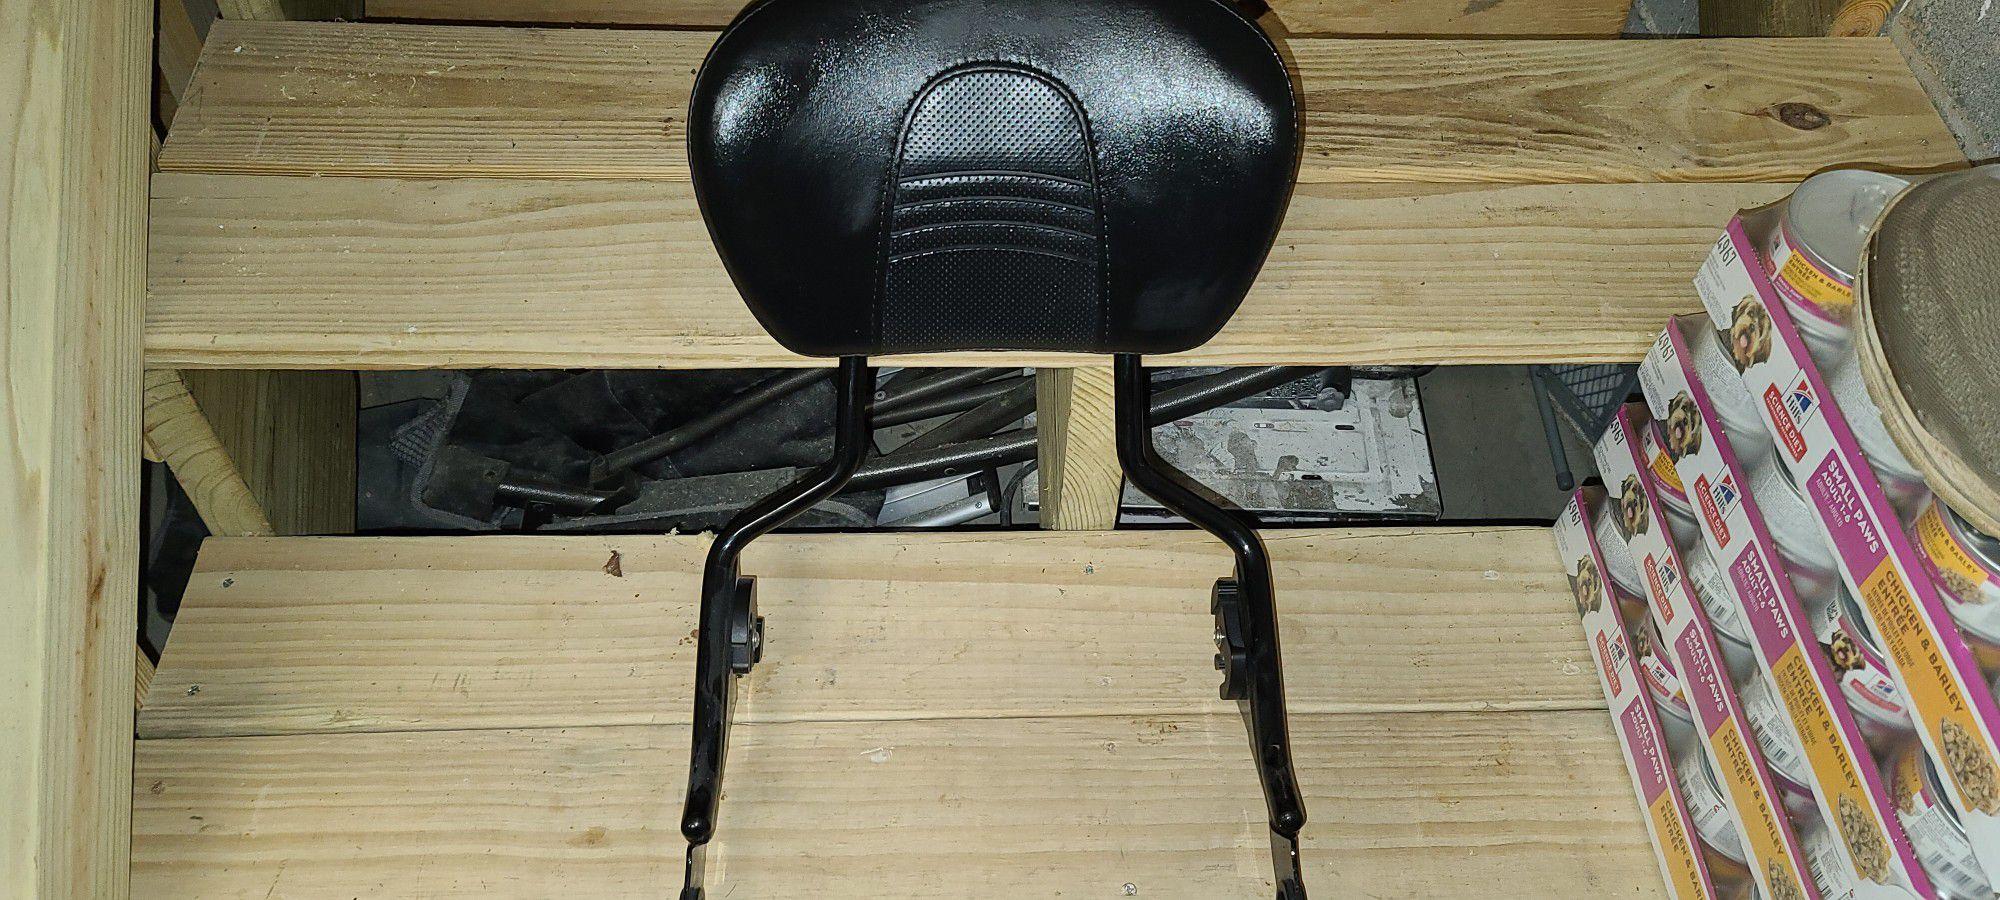 Photo Fits 09 to 2022 Harley Davison HD Detachables Sissy Bar Upright and Street Glide Stitch Passenger Backrest Pad